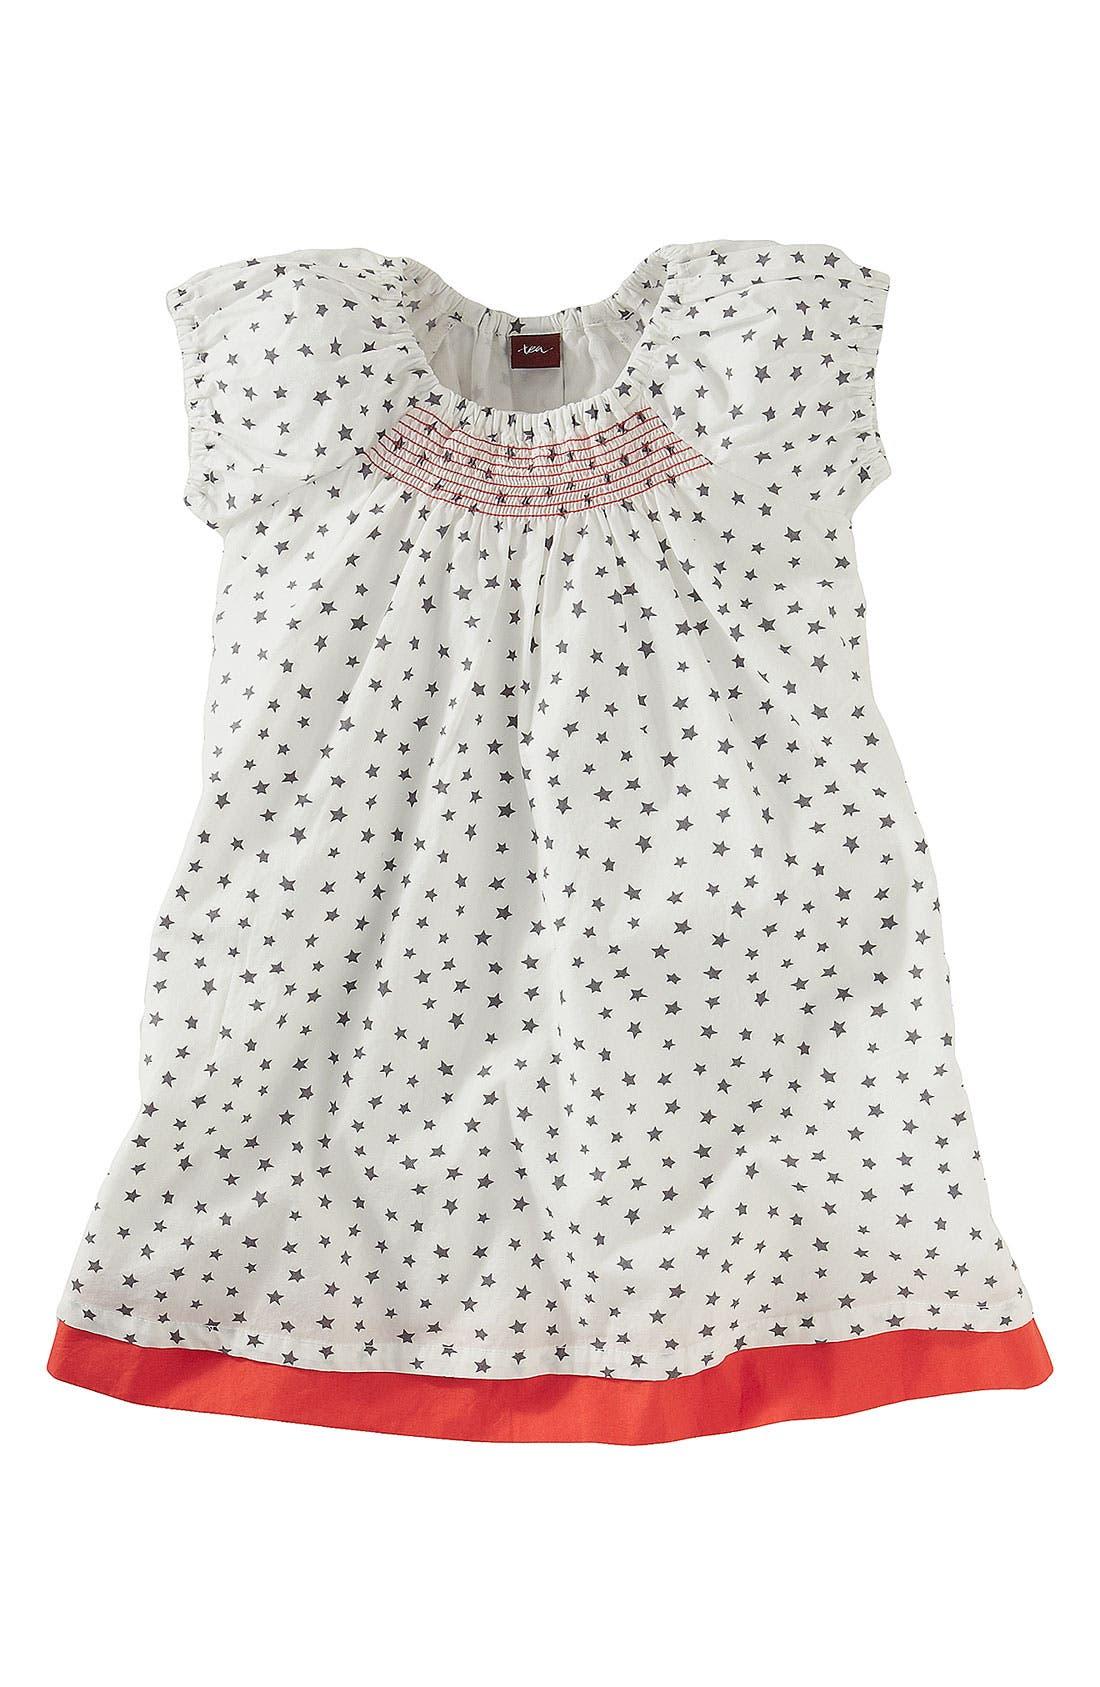 Alternate Image 1 Selected - Tea Collection Smocked Dress (Toddler)